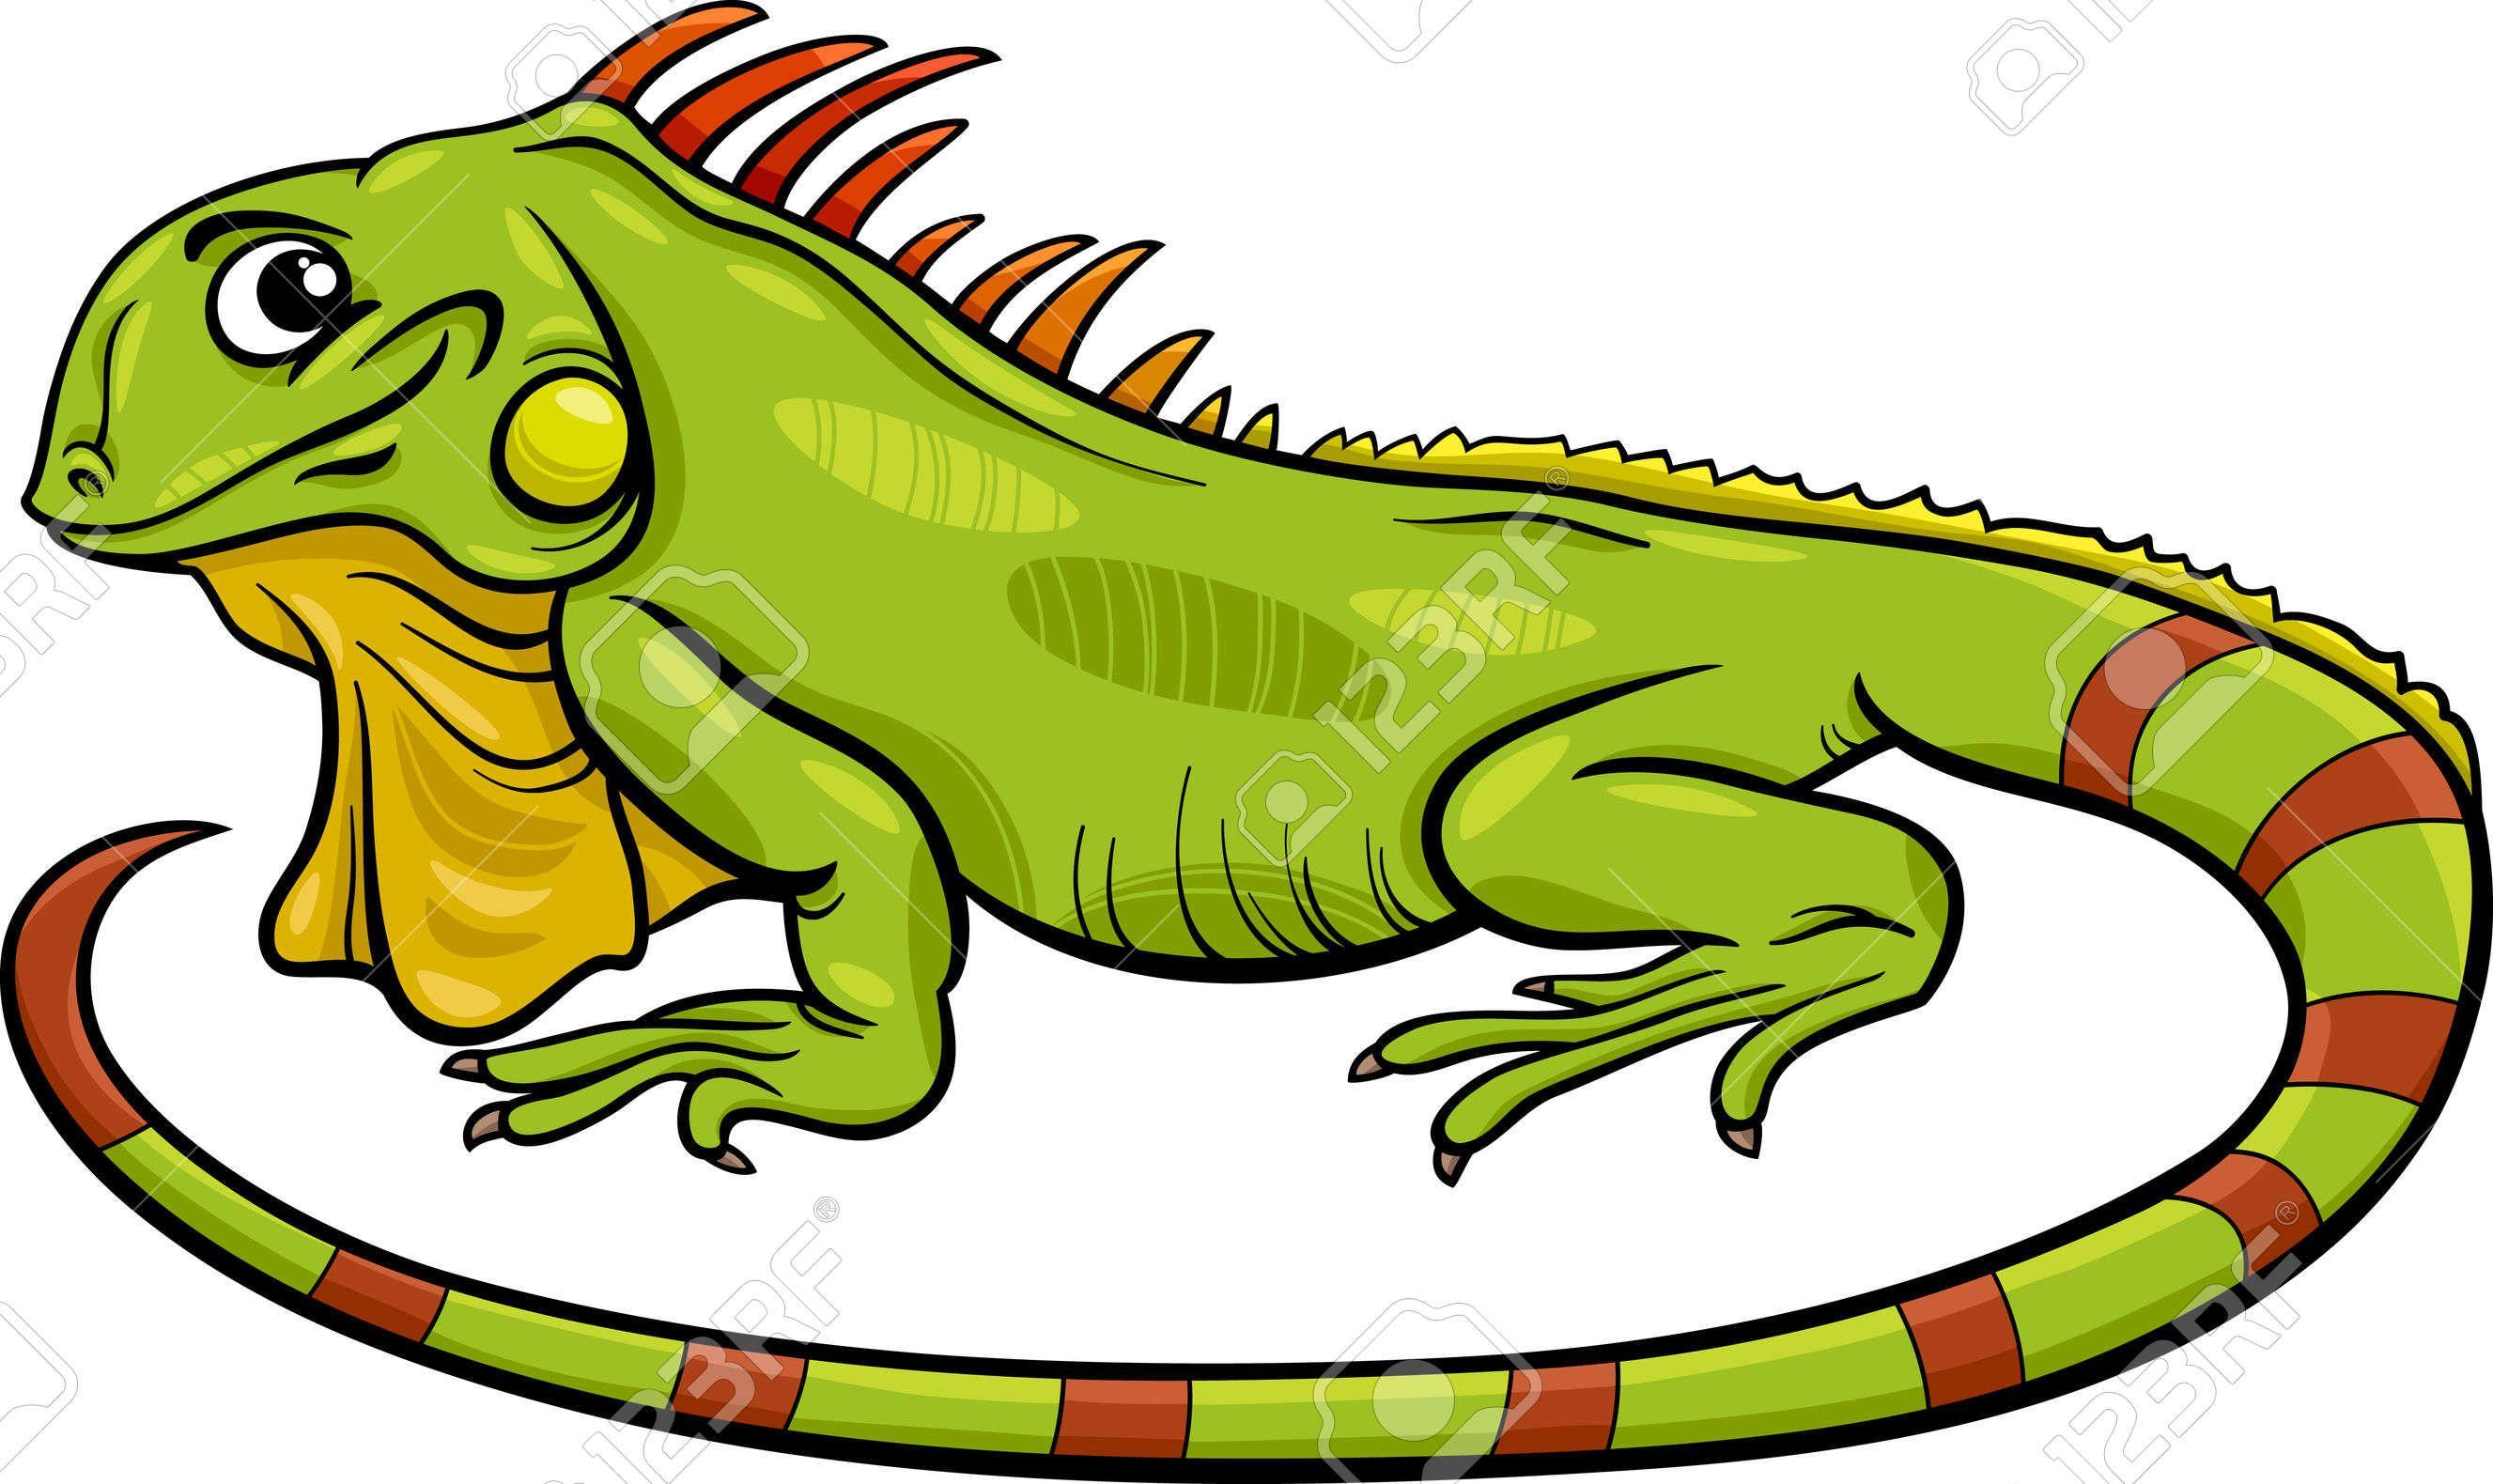 Ilustracion De Dibujos Animados Divertido Del Personaje De Iguana Lagarto Reptil Animal Iguana Dibujo Dibujos Animados Divertidos Ilustraciones De Dibujos Animados